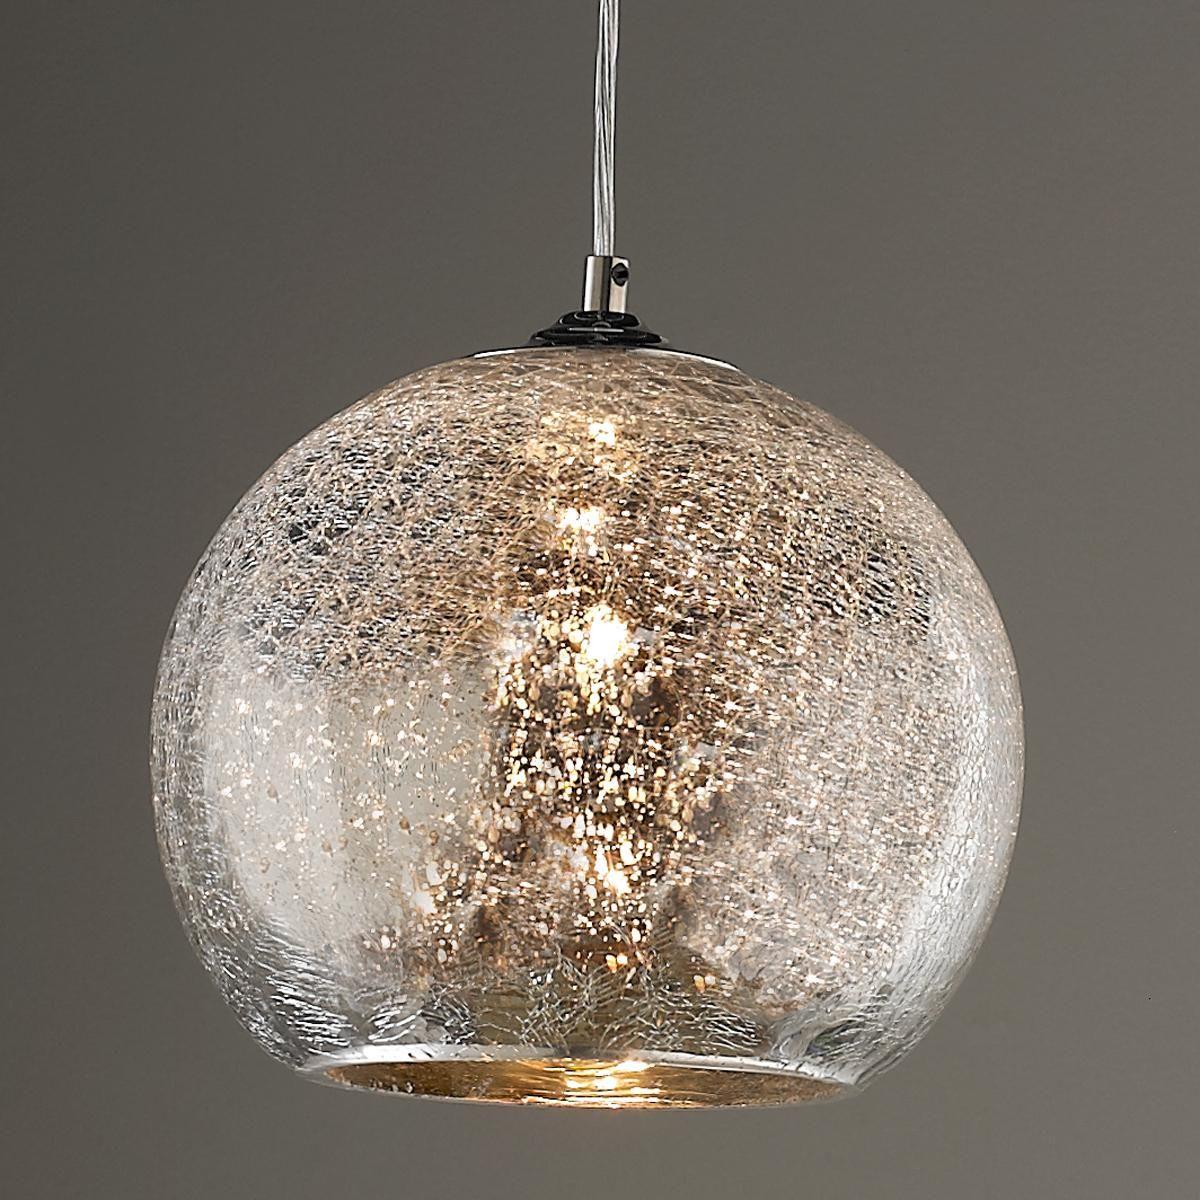 Crackled Mercury Bowl Pendant Light Mercury Glass Pendant Light Pendant Light Shades Glass Pendant Light